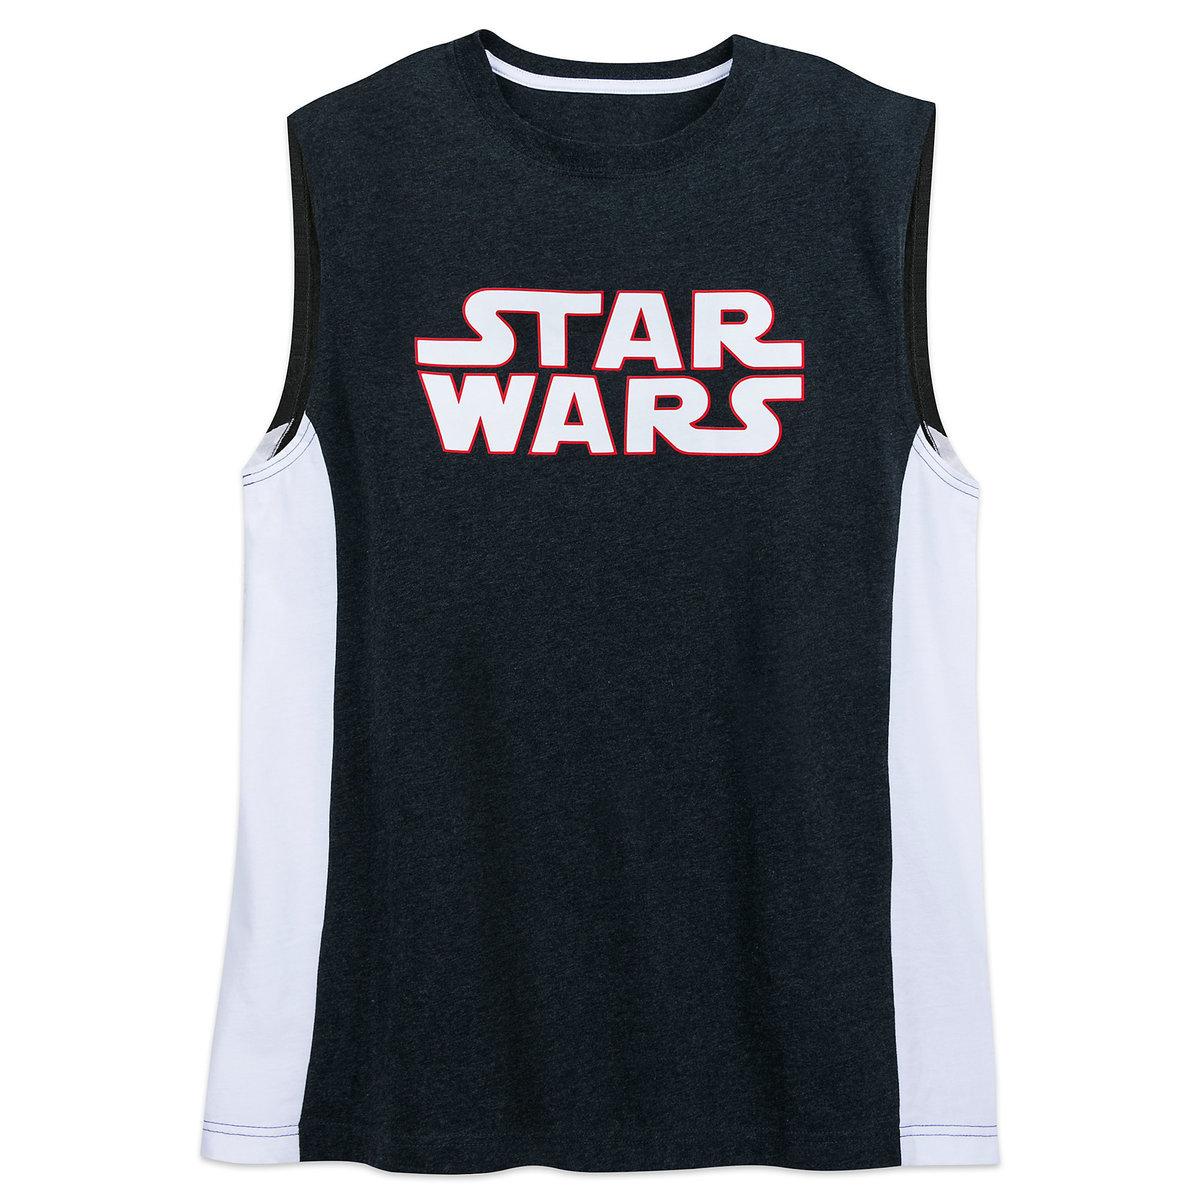 a0a5069c12b09 Add to My Lists. Disney Men s Sleep Shirt - Star Wars Tank Top